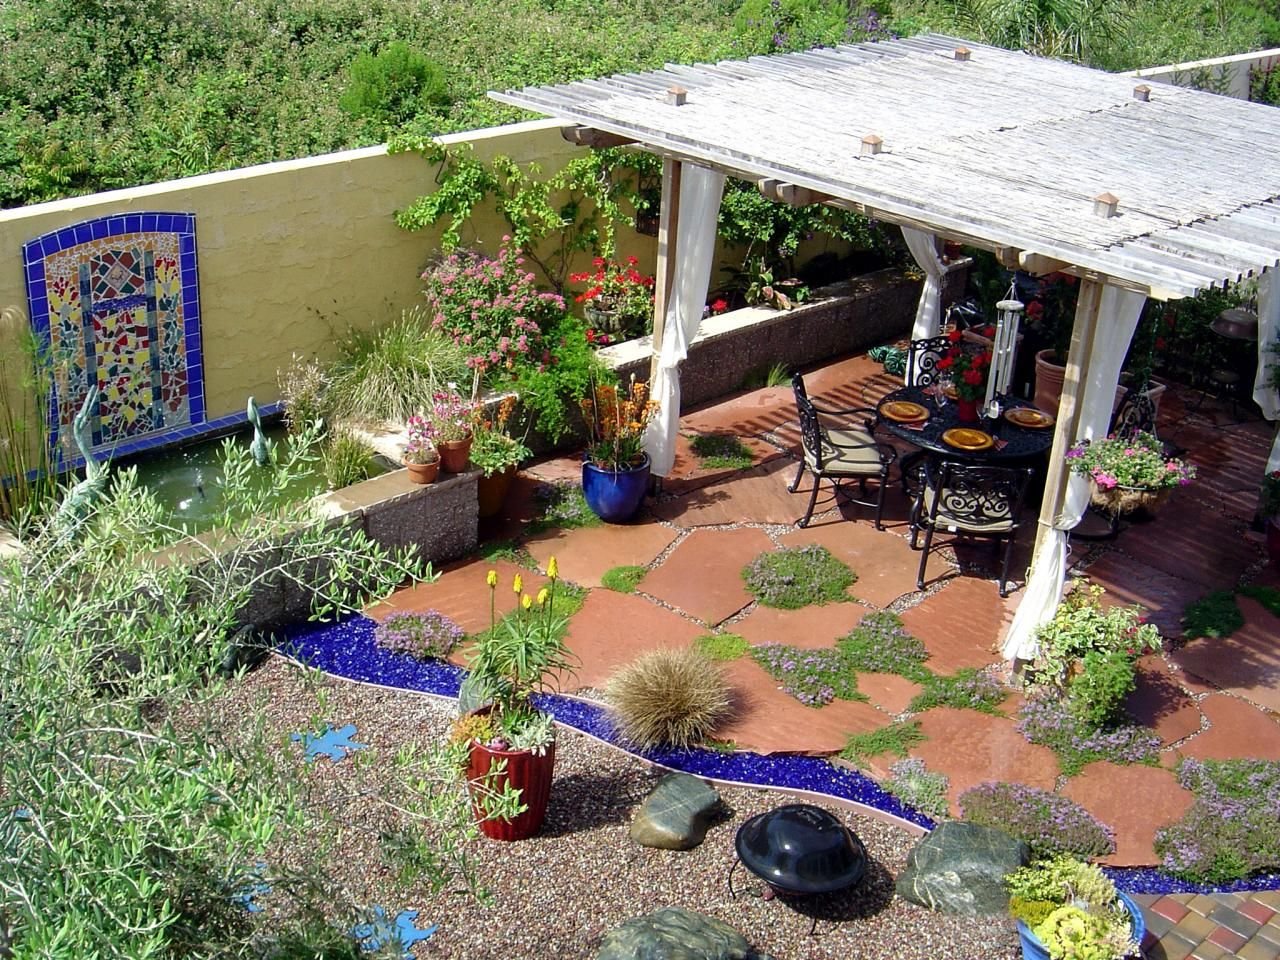 Desert Xeriscape And Rock Gardens Patio IdeasGarden IdeasBackyard IdeasDiy Garden ProjectsLandscaping